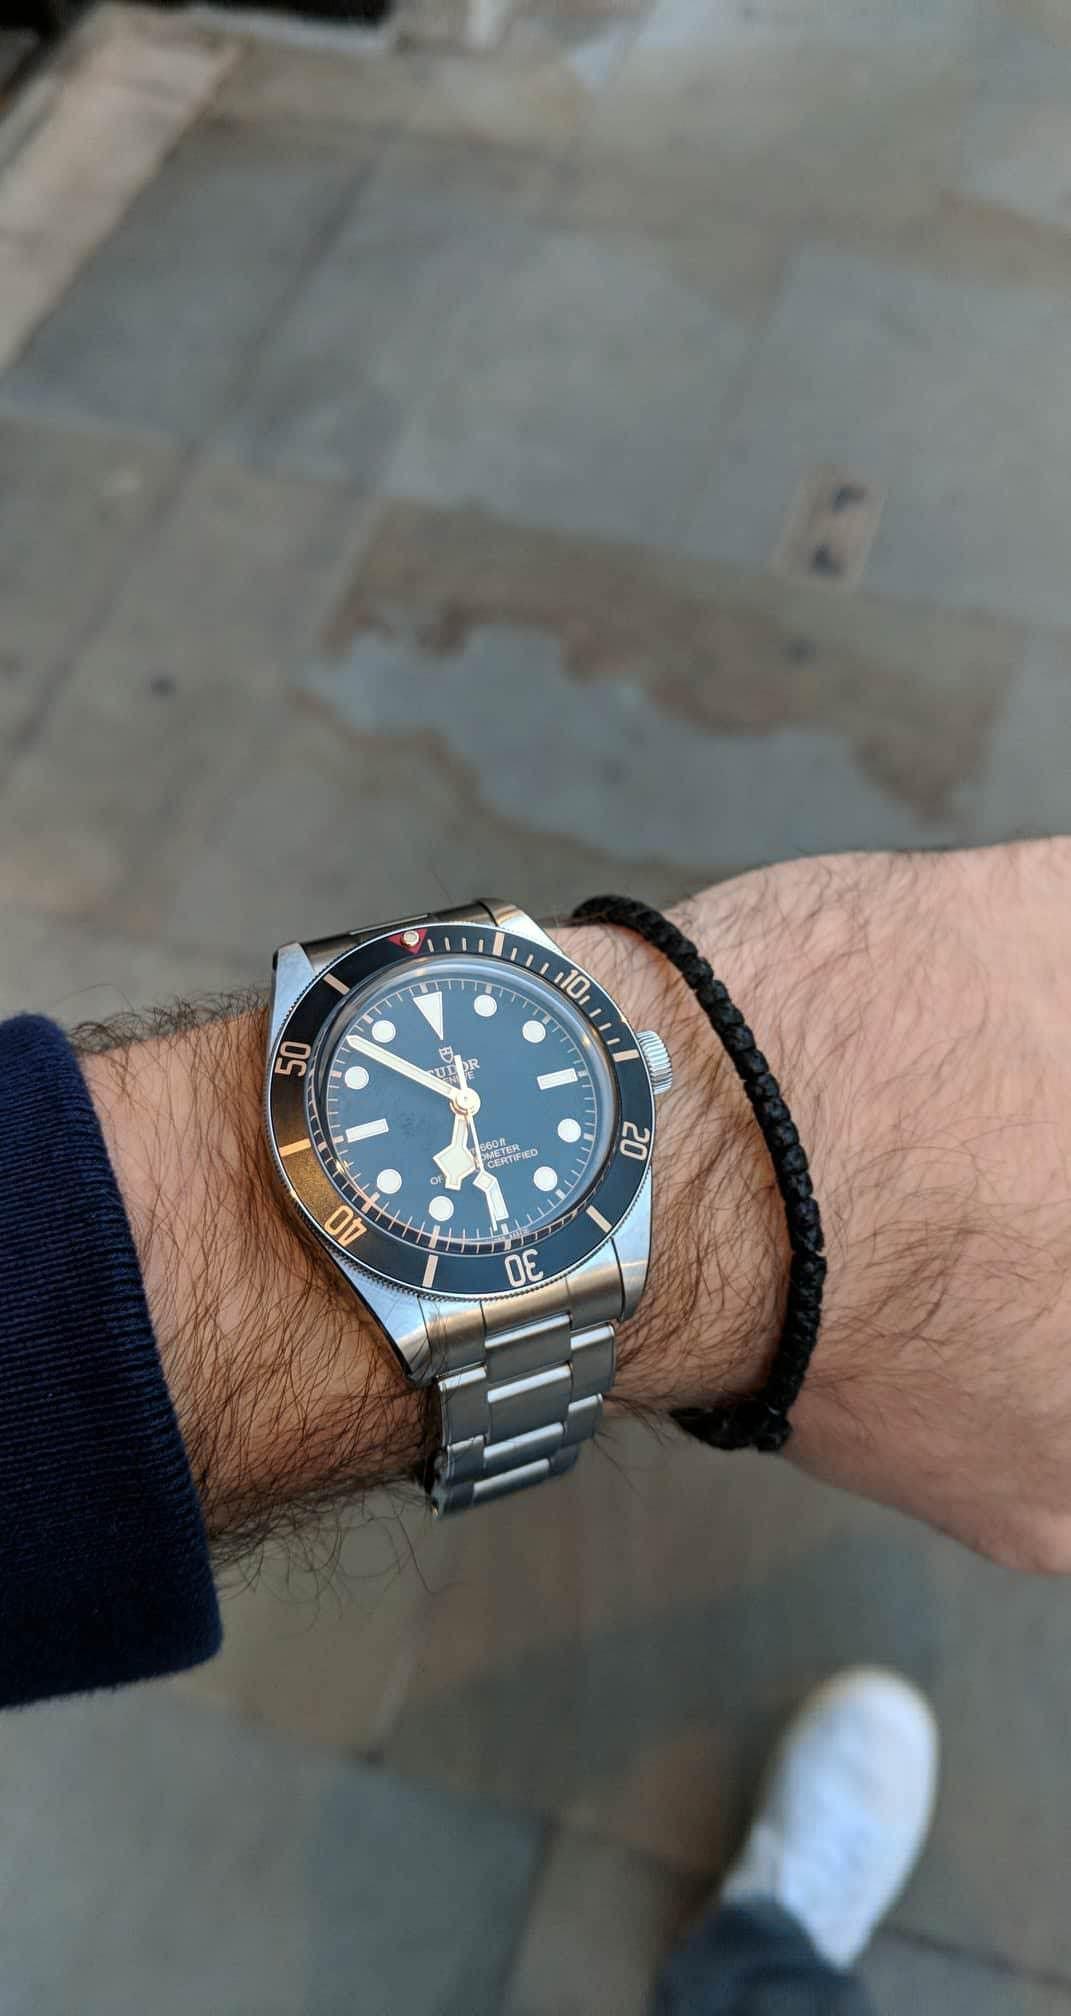 Tudor Black Bay 58 Watches In 2019 Tudor Black Bay Rolex Tudor